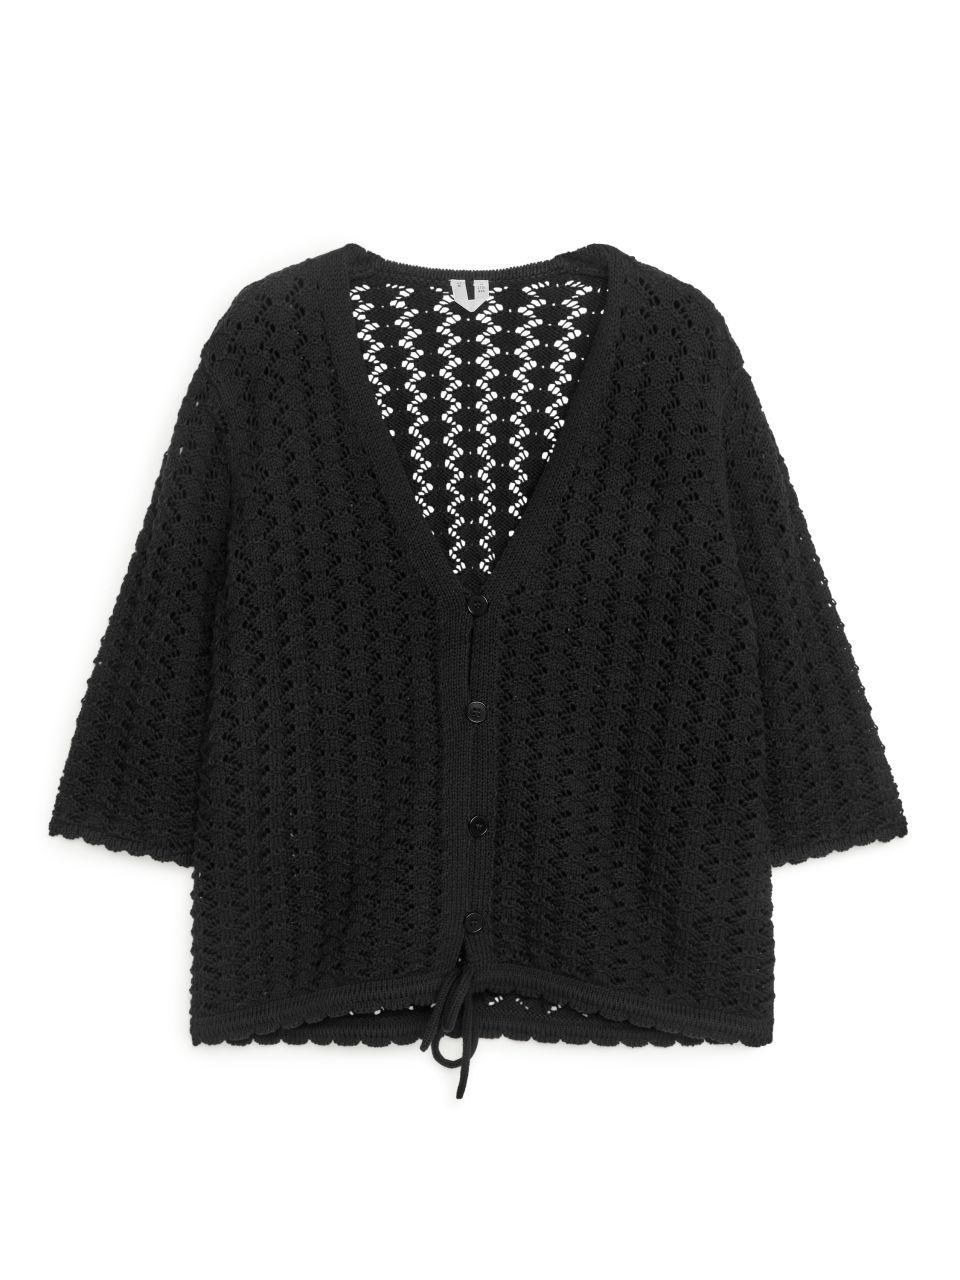 Lace Knit Cardigan - Black